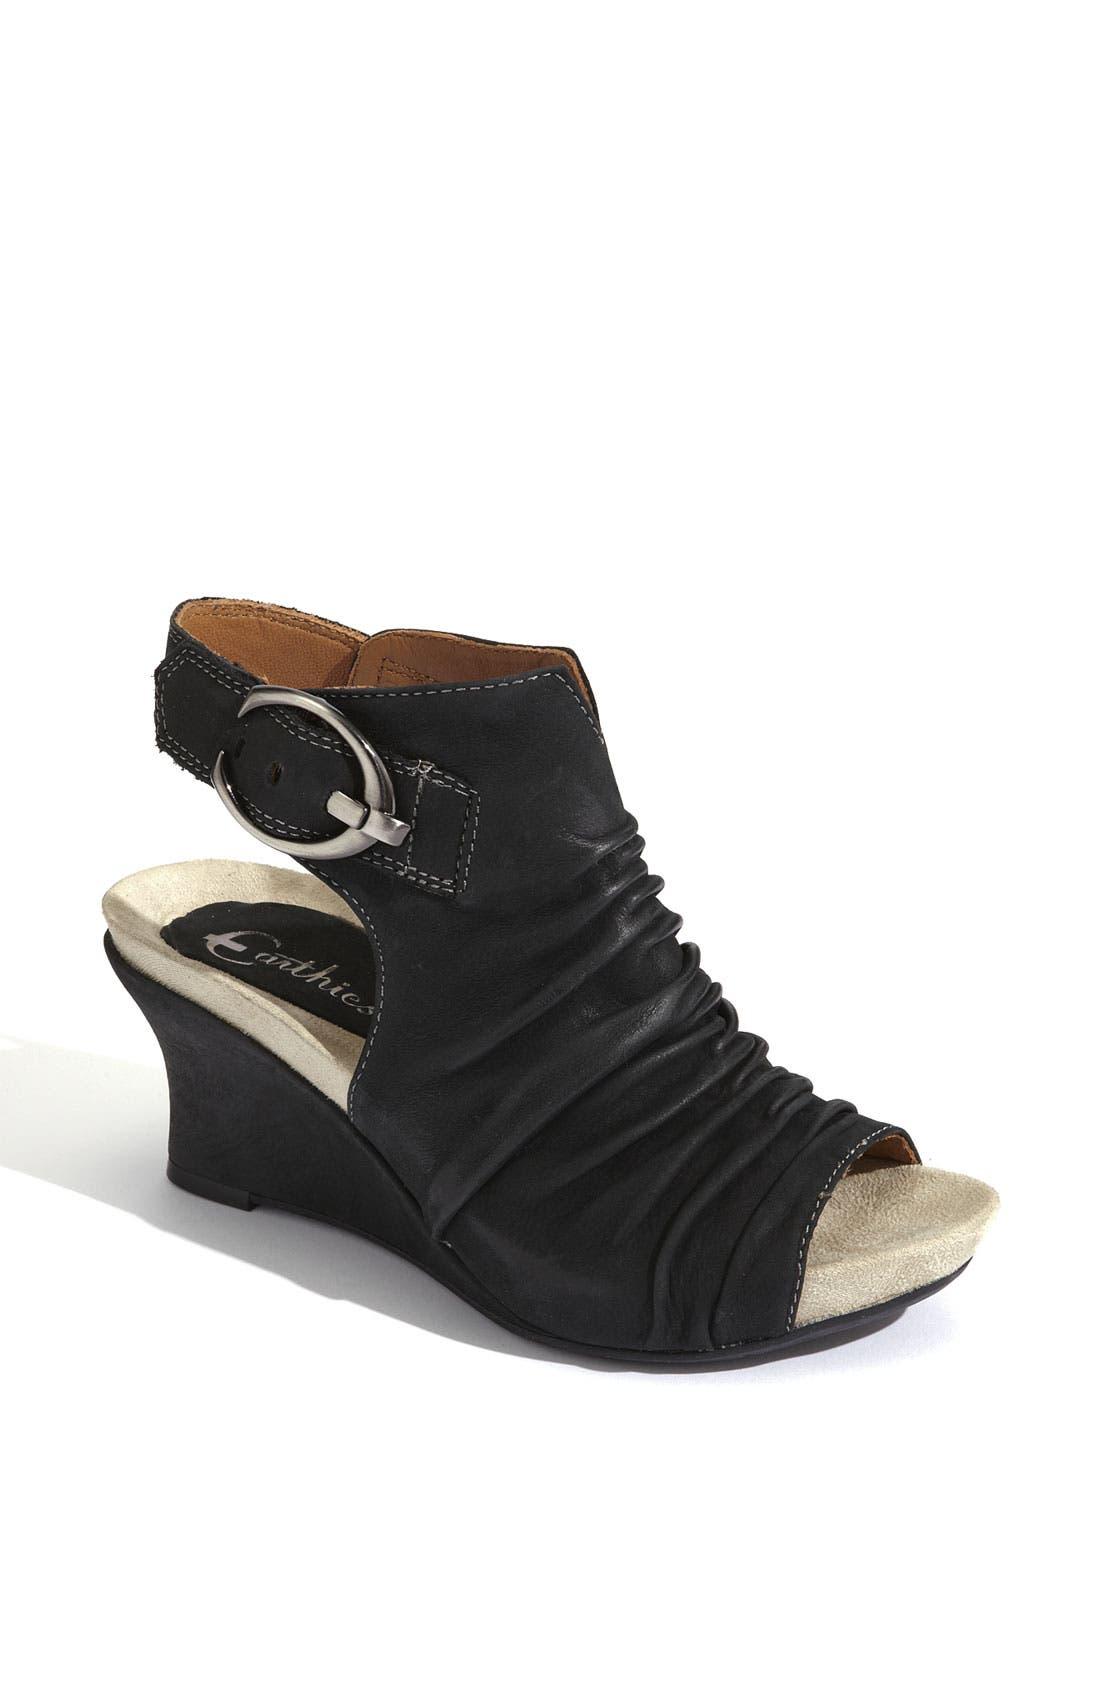 Alternate Image 1 Selected - Earthies® 'Bonaire Too' Wedge Sandal